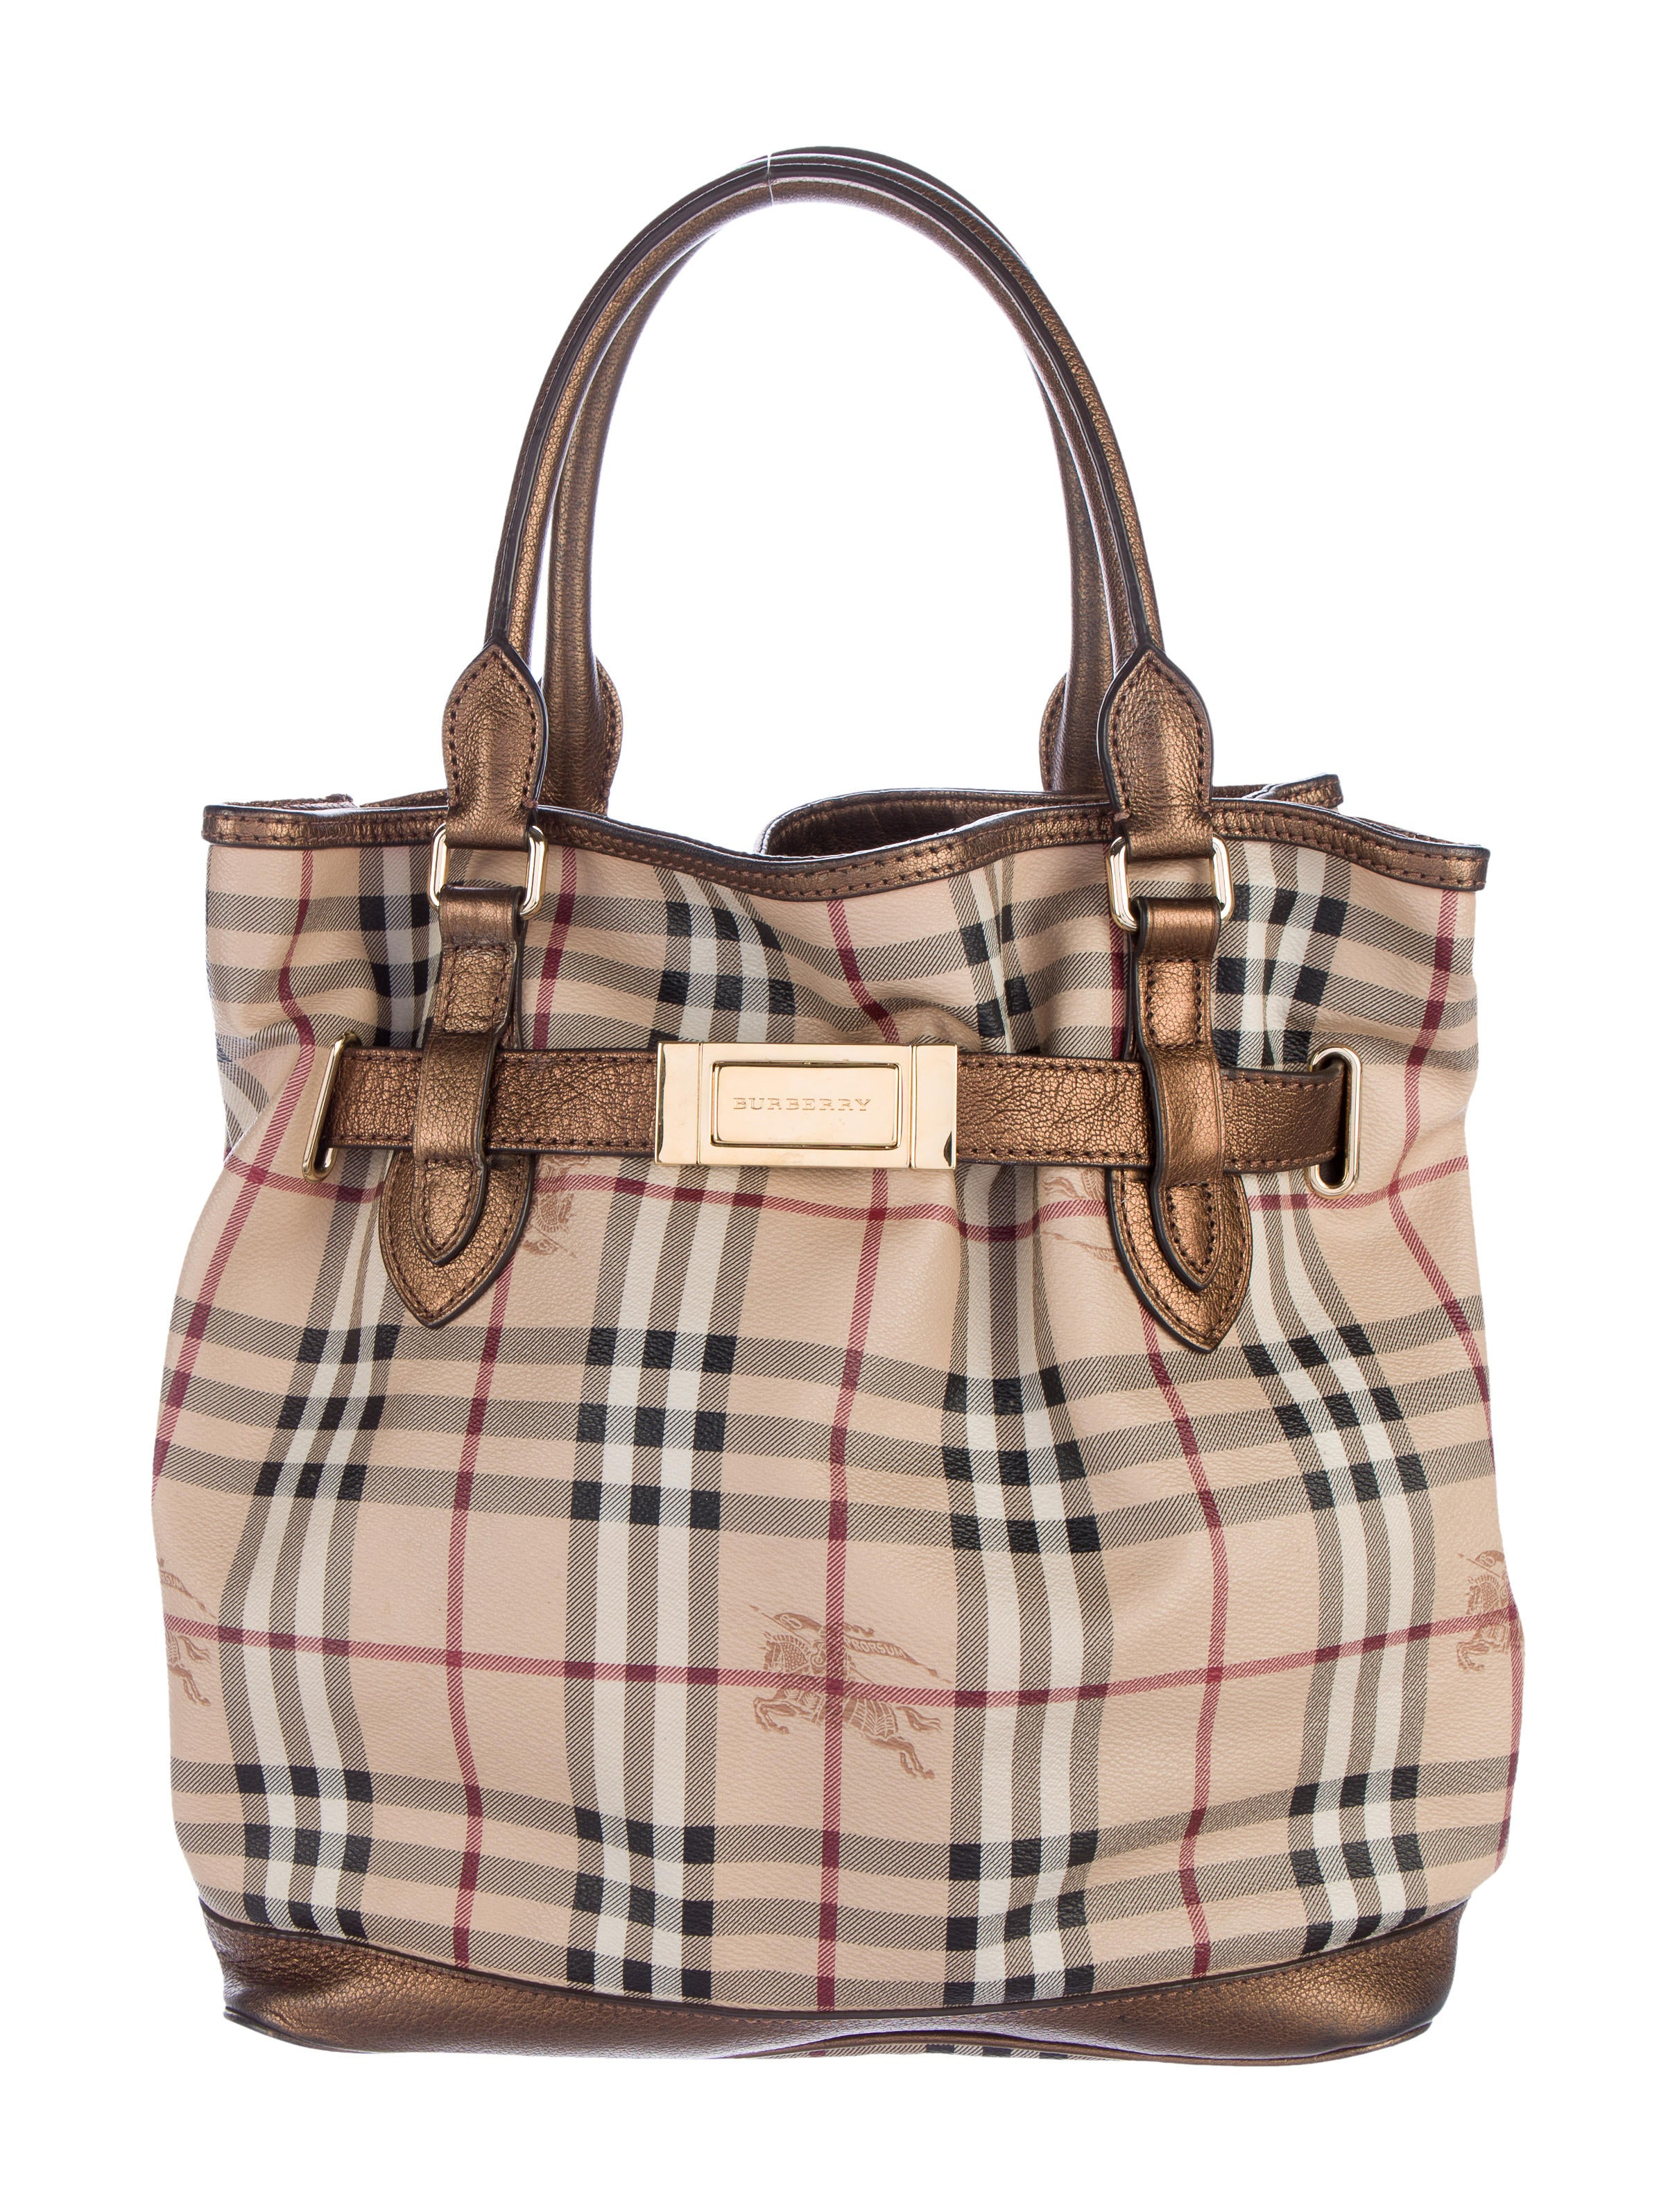 82c8078793c0 Burberry Haymarket Check Golderton Tote - Handbags - BUR67333